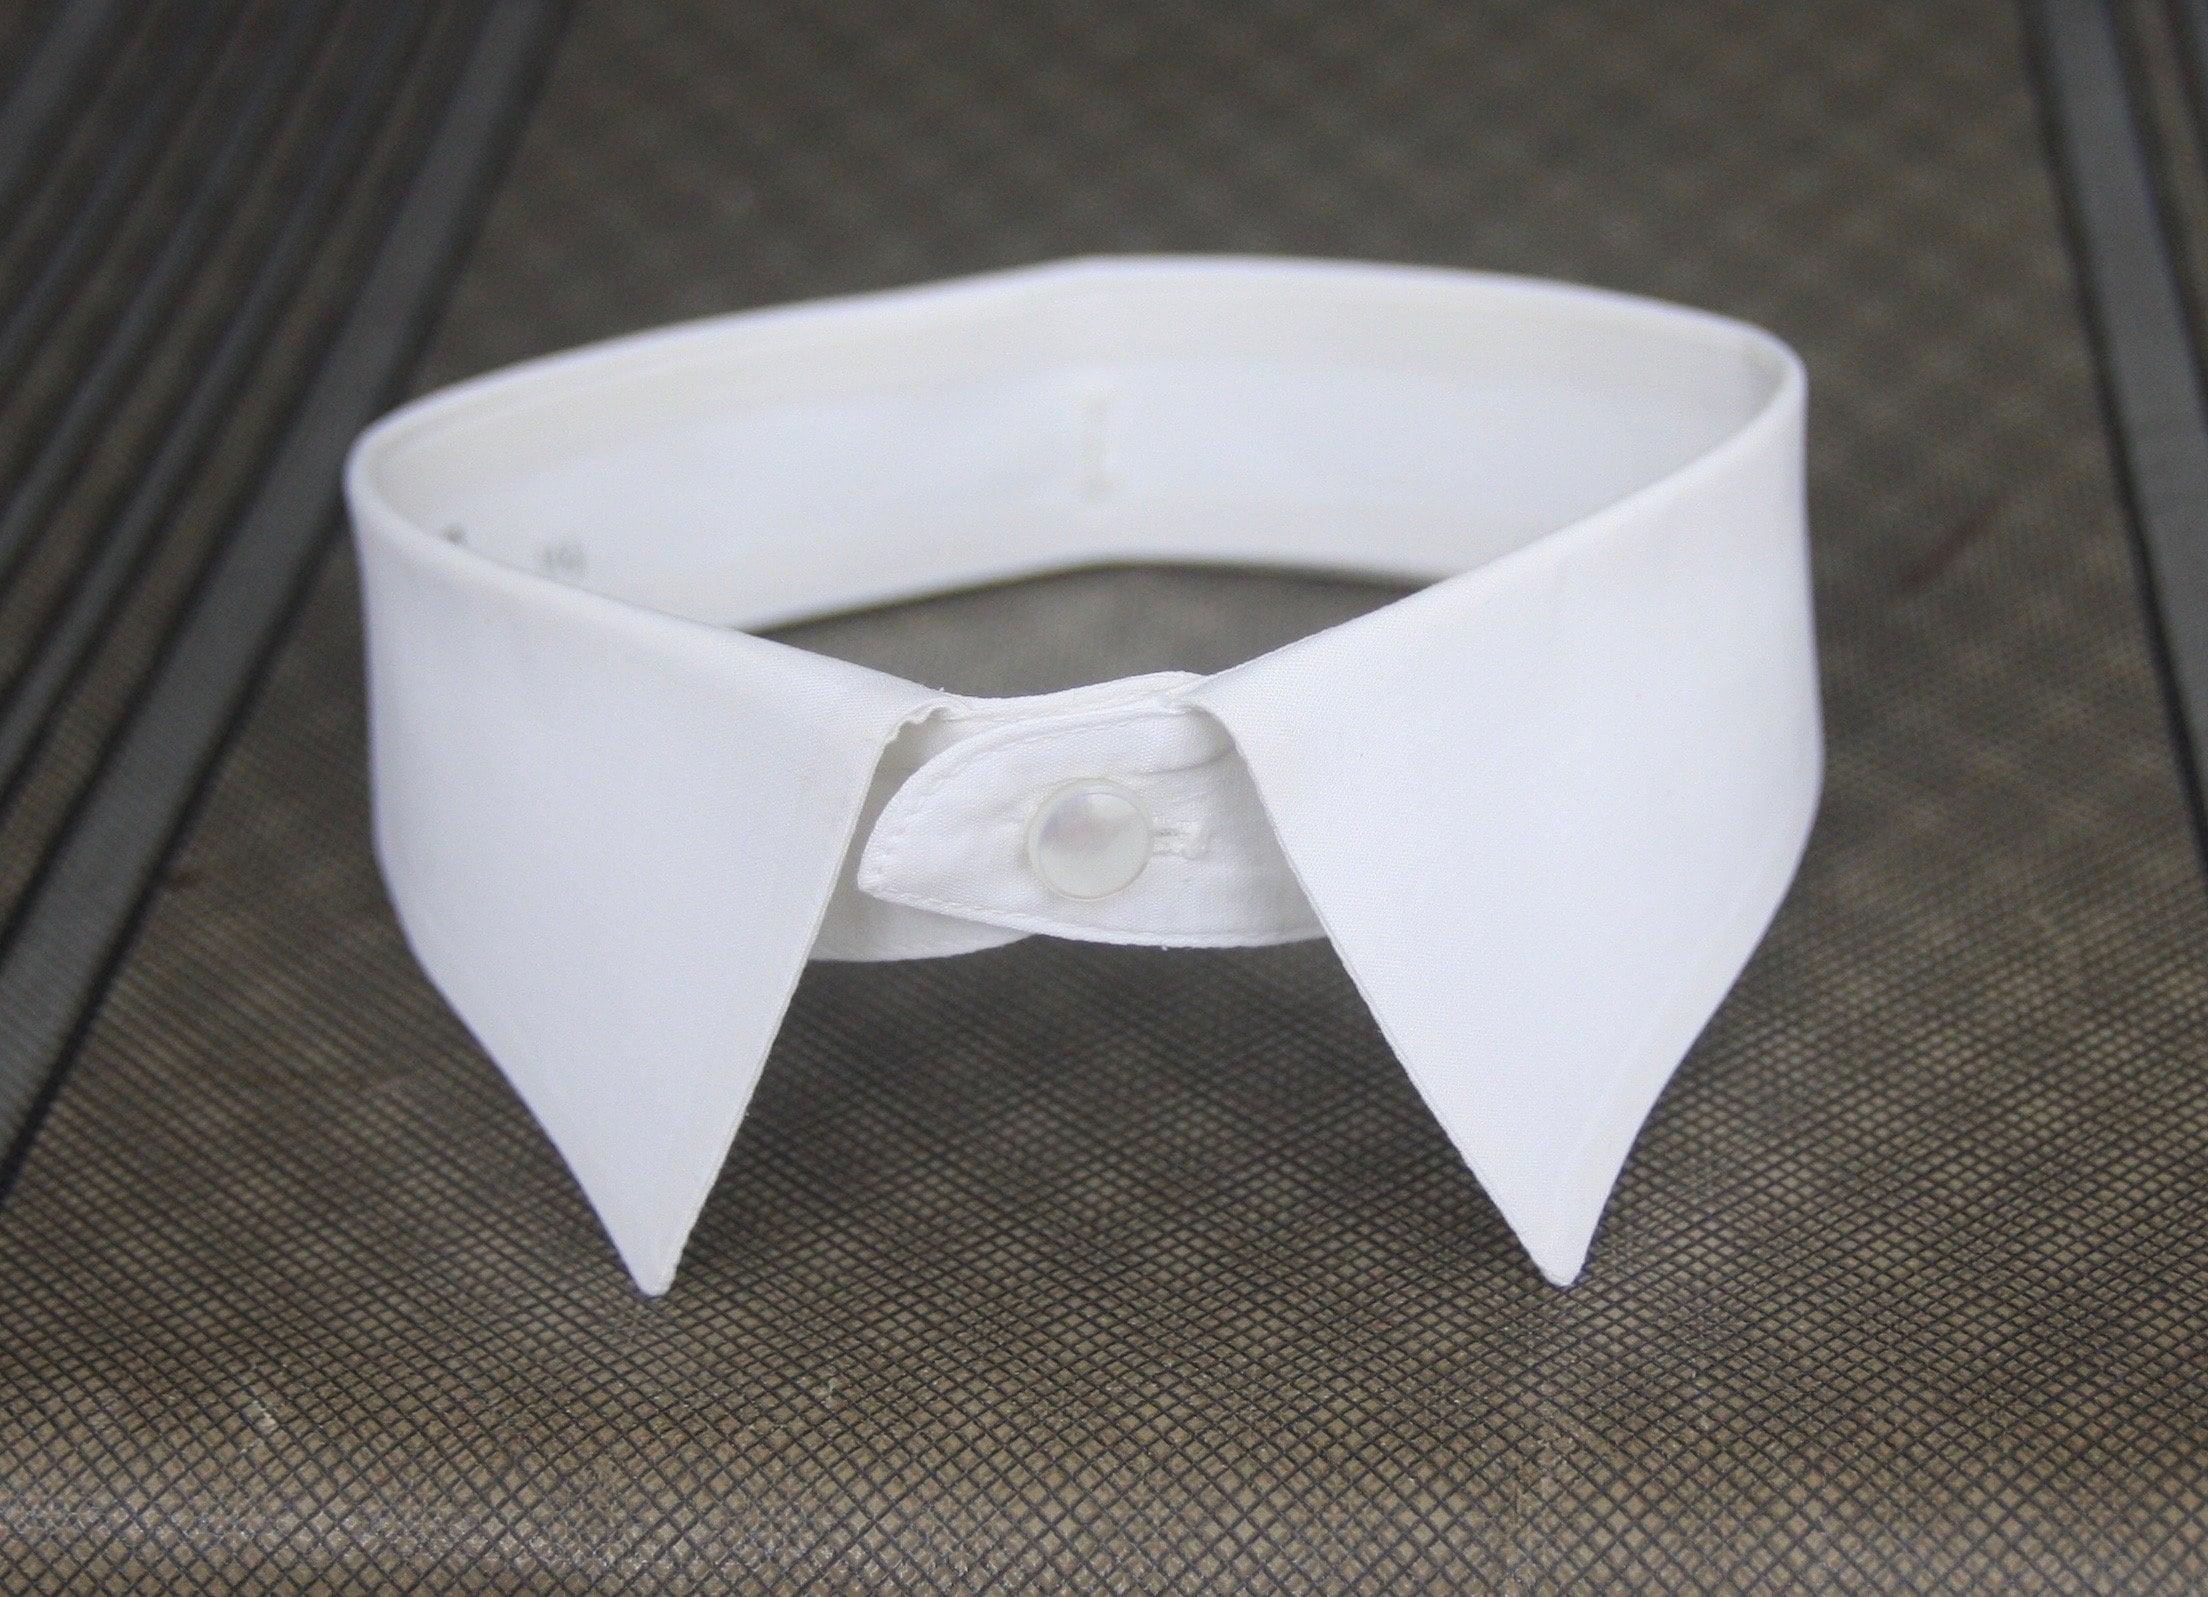 Vintage Mens Detachable Shirt Collar 16 12 Etsy